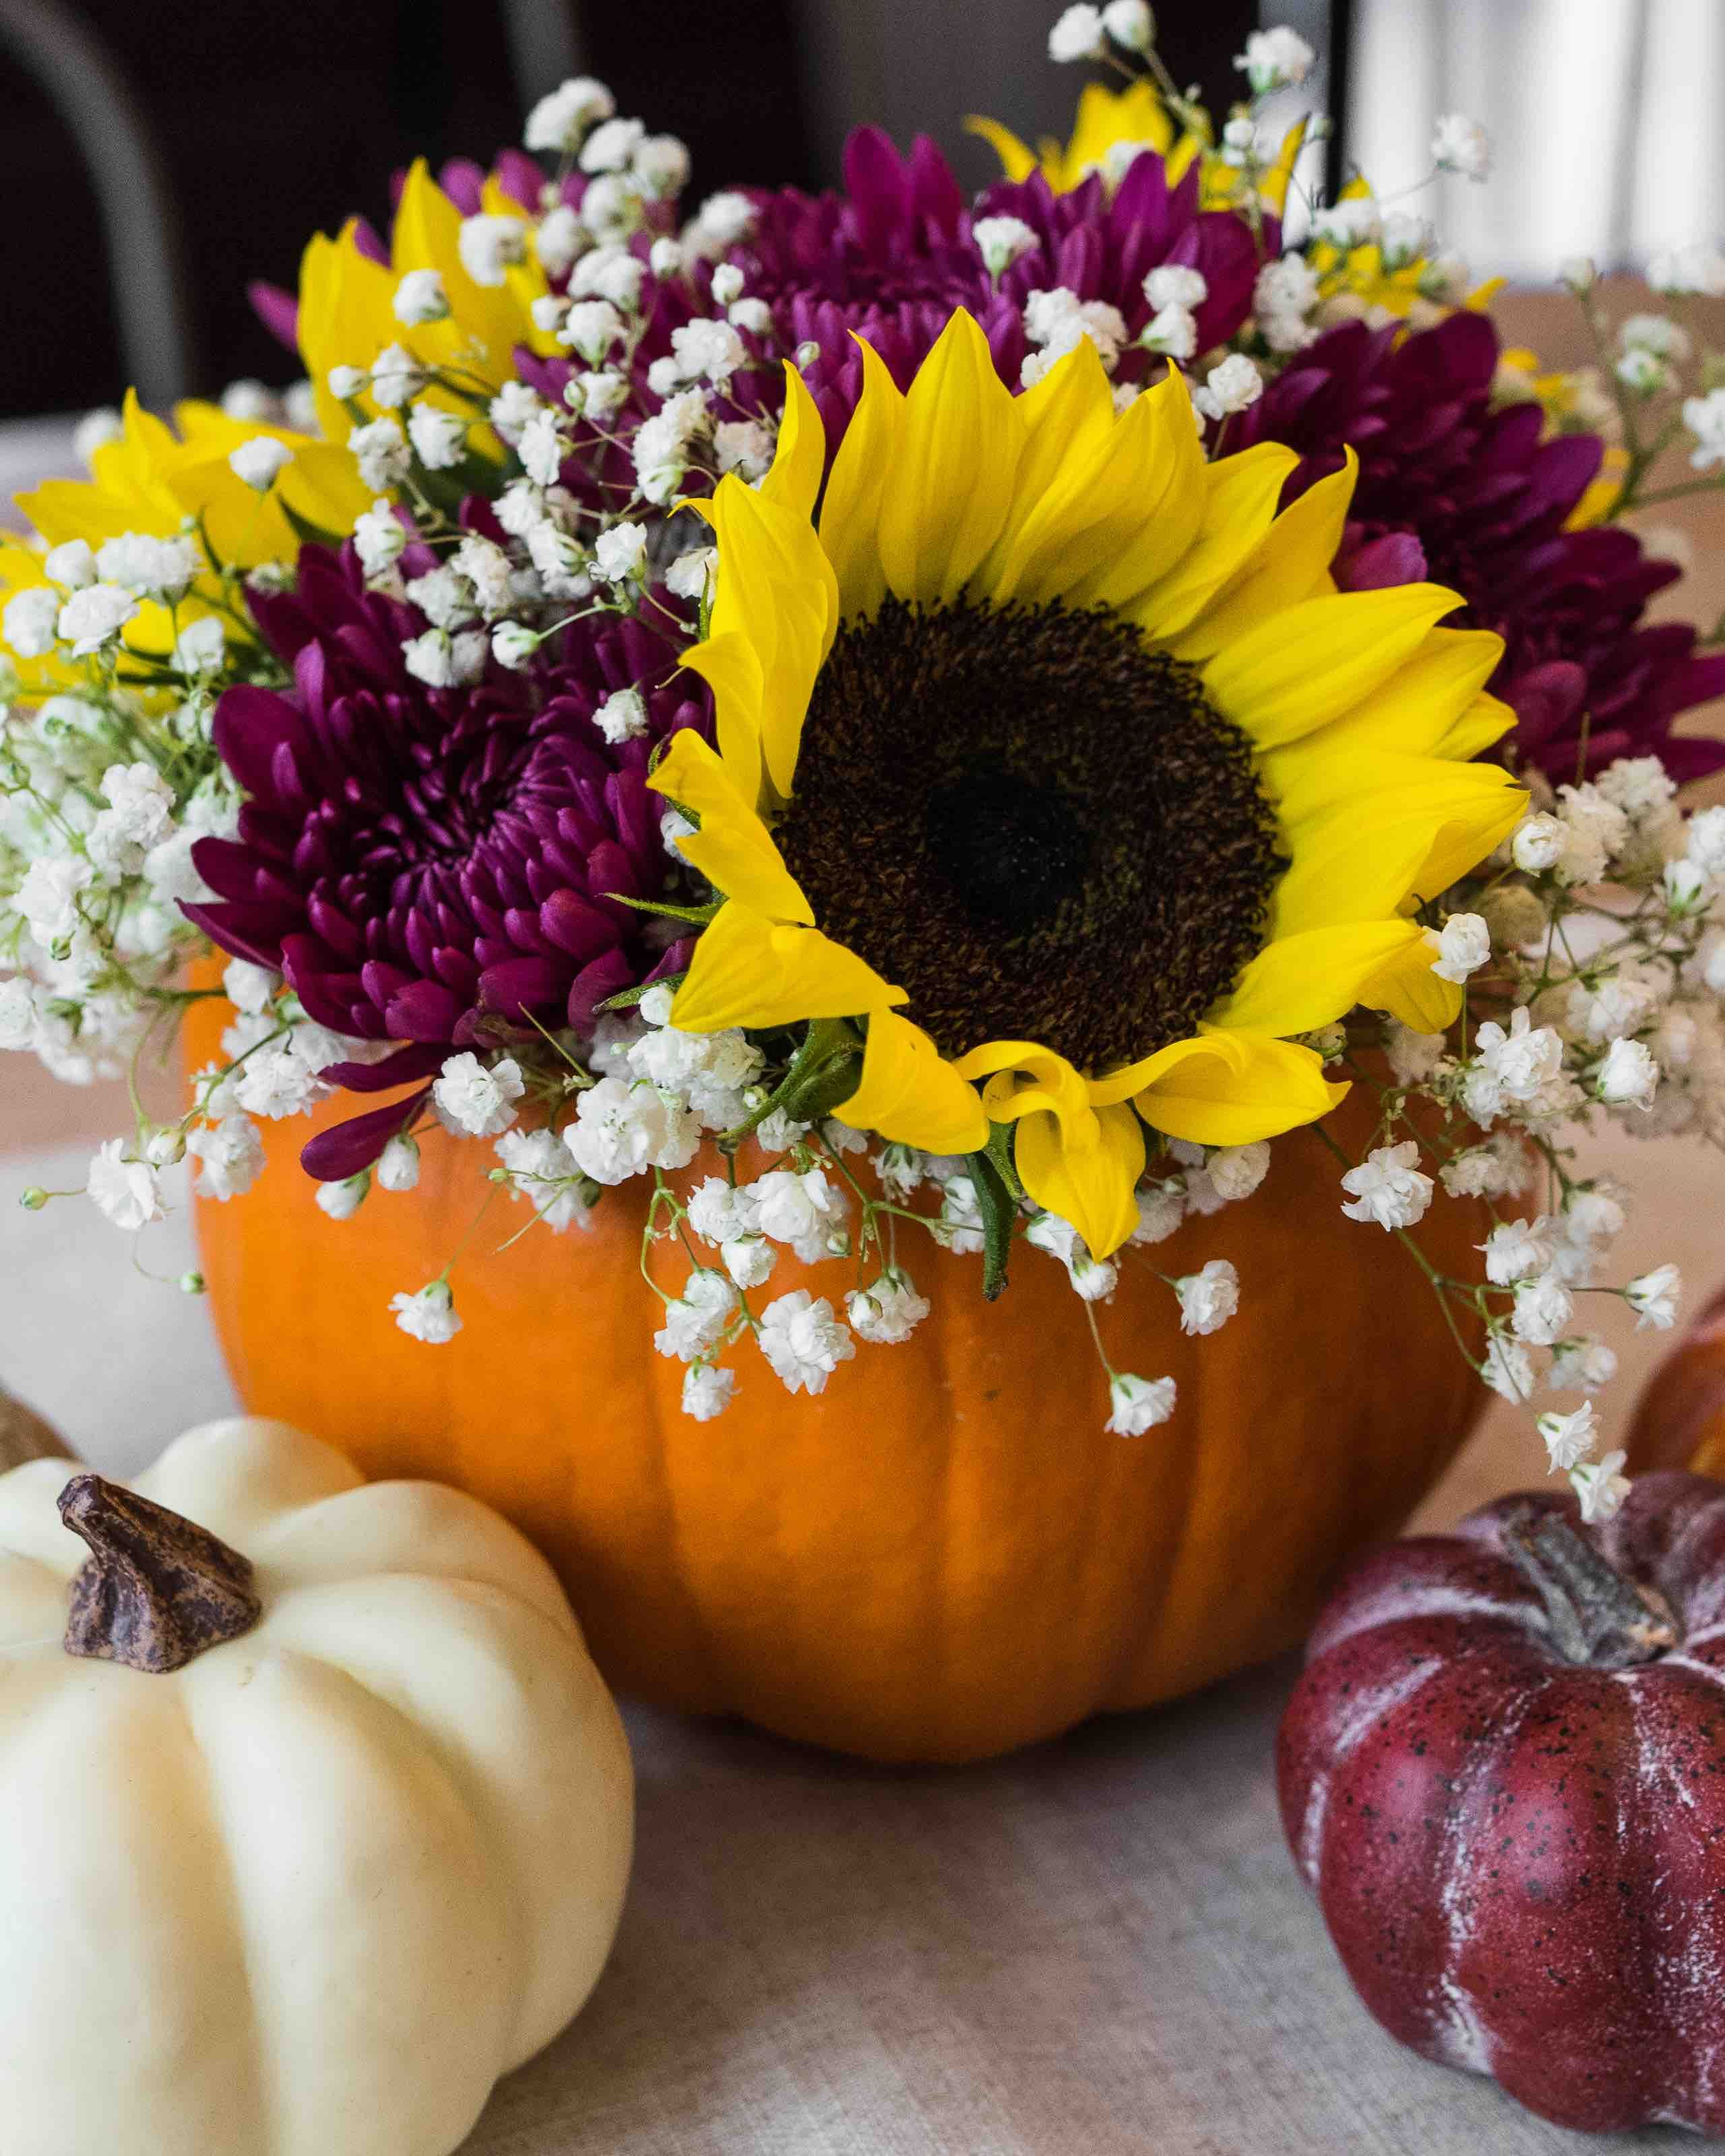 5 Ways To Diy With Fresh Pumpkins Half Full Pumpkin Floral Arrangements Fresh Flowers Arrangements Pumpkin Vase